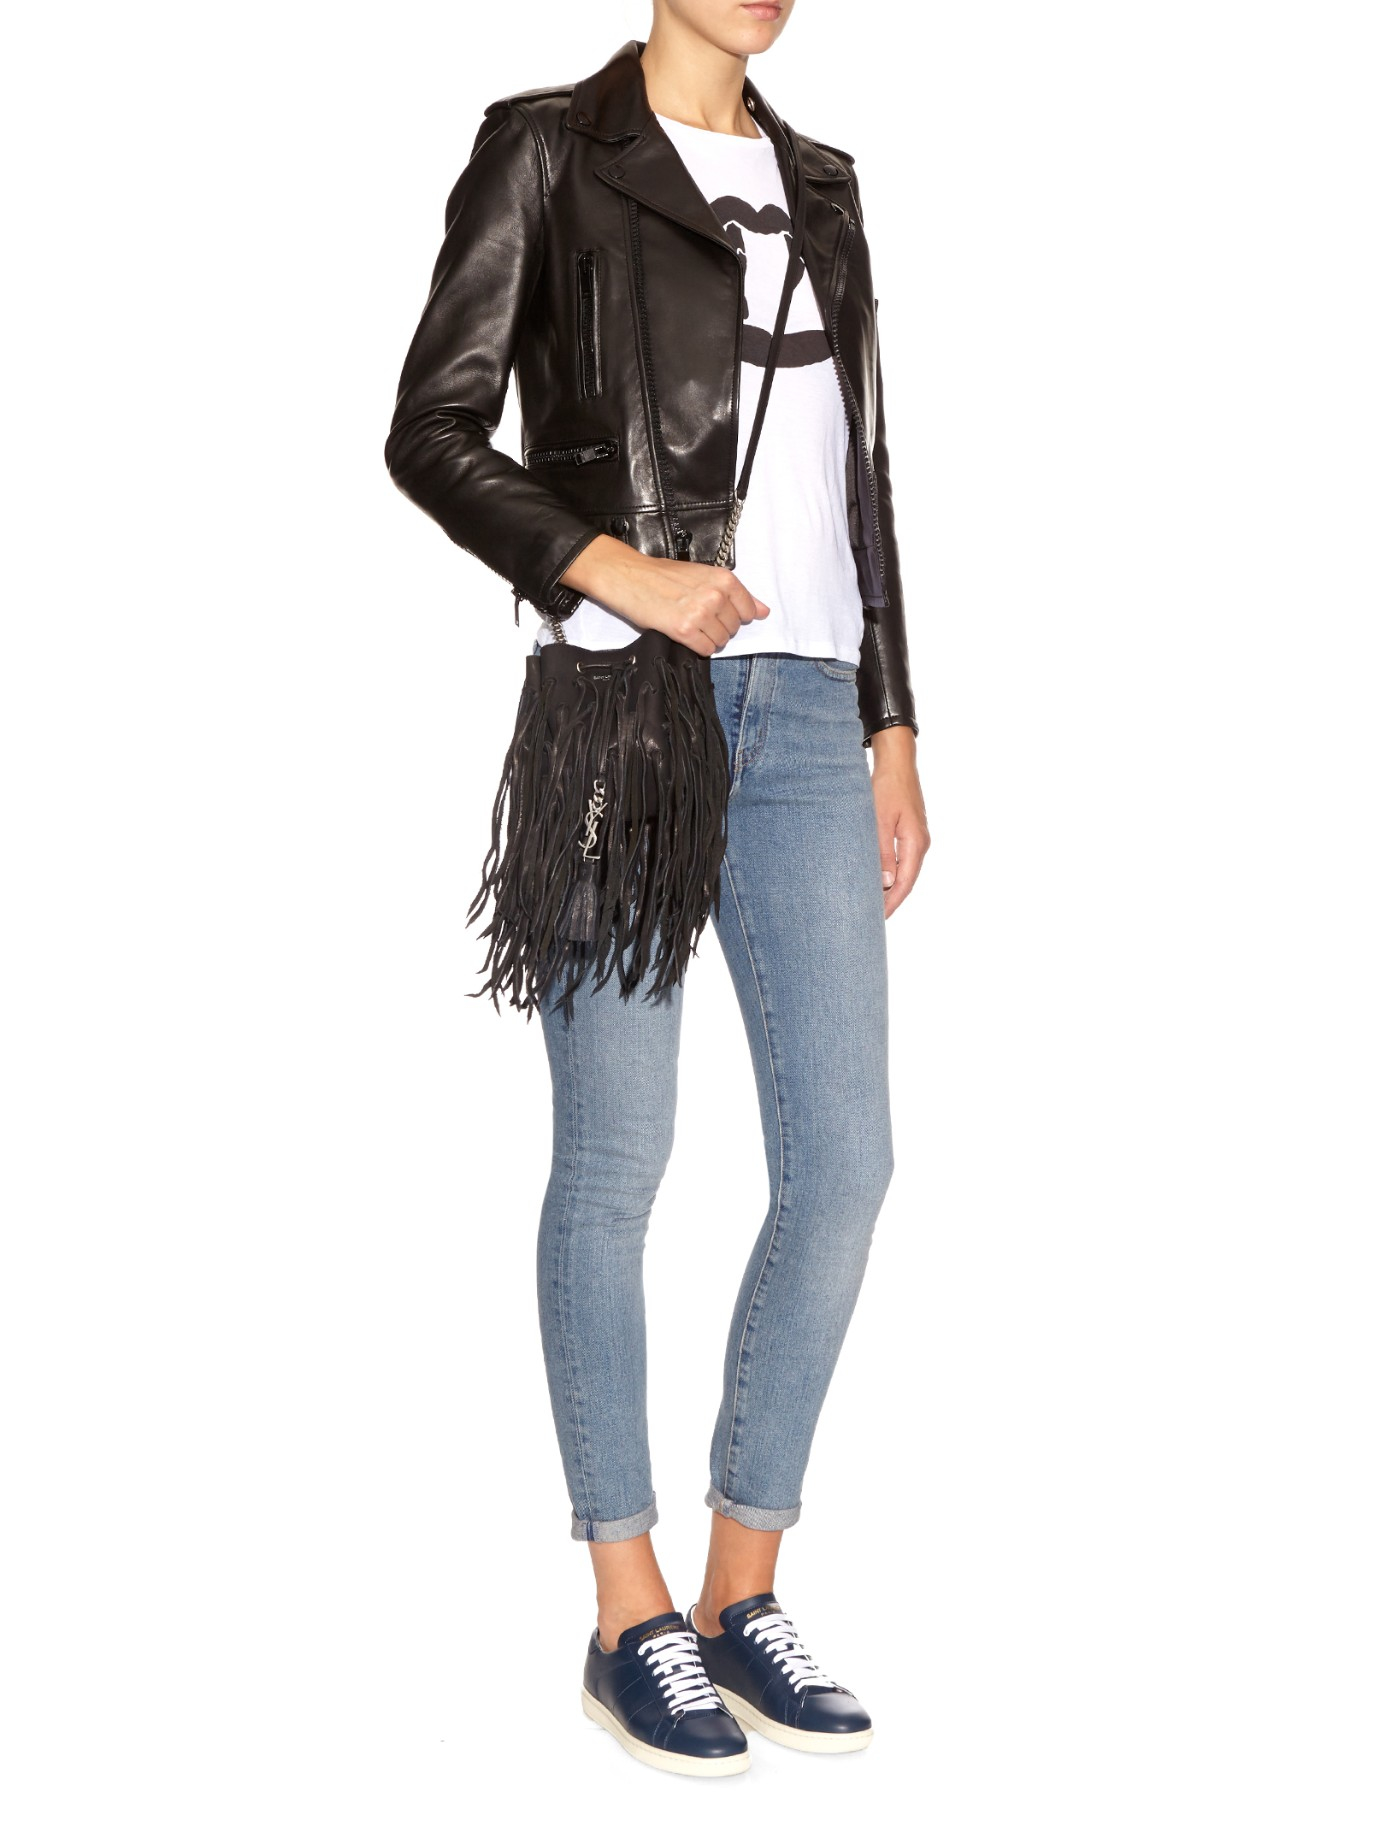 Lyst - Saint Laurent Bourse Monogram Fringed-Leather Cross-Body Bag ... 94e012bfd2df1